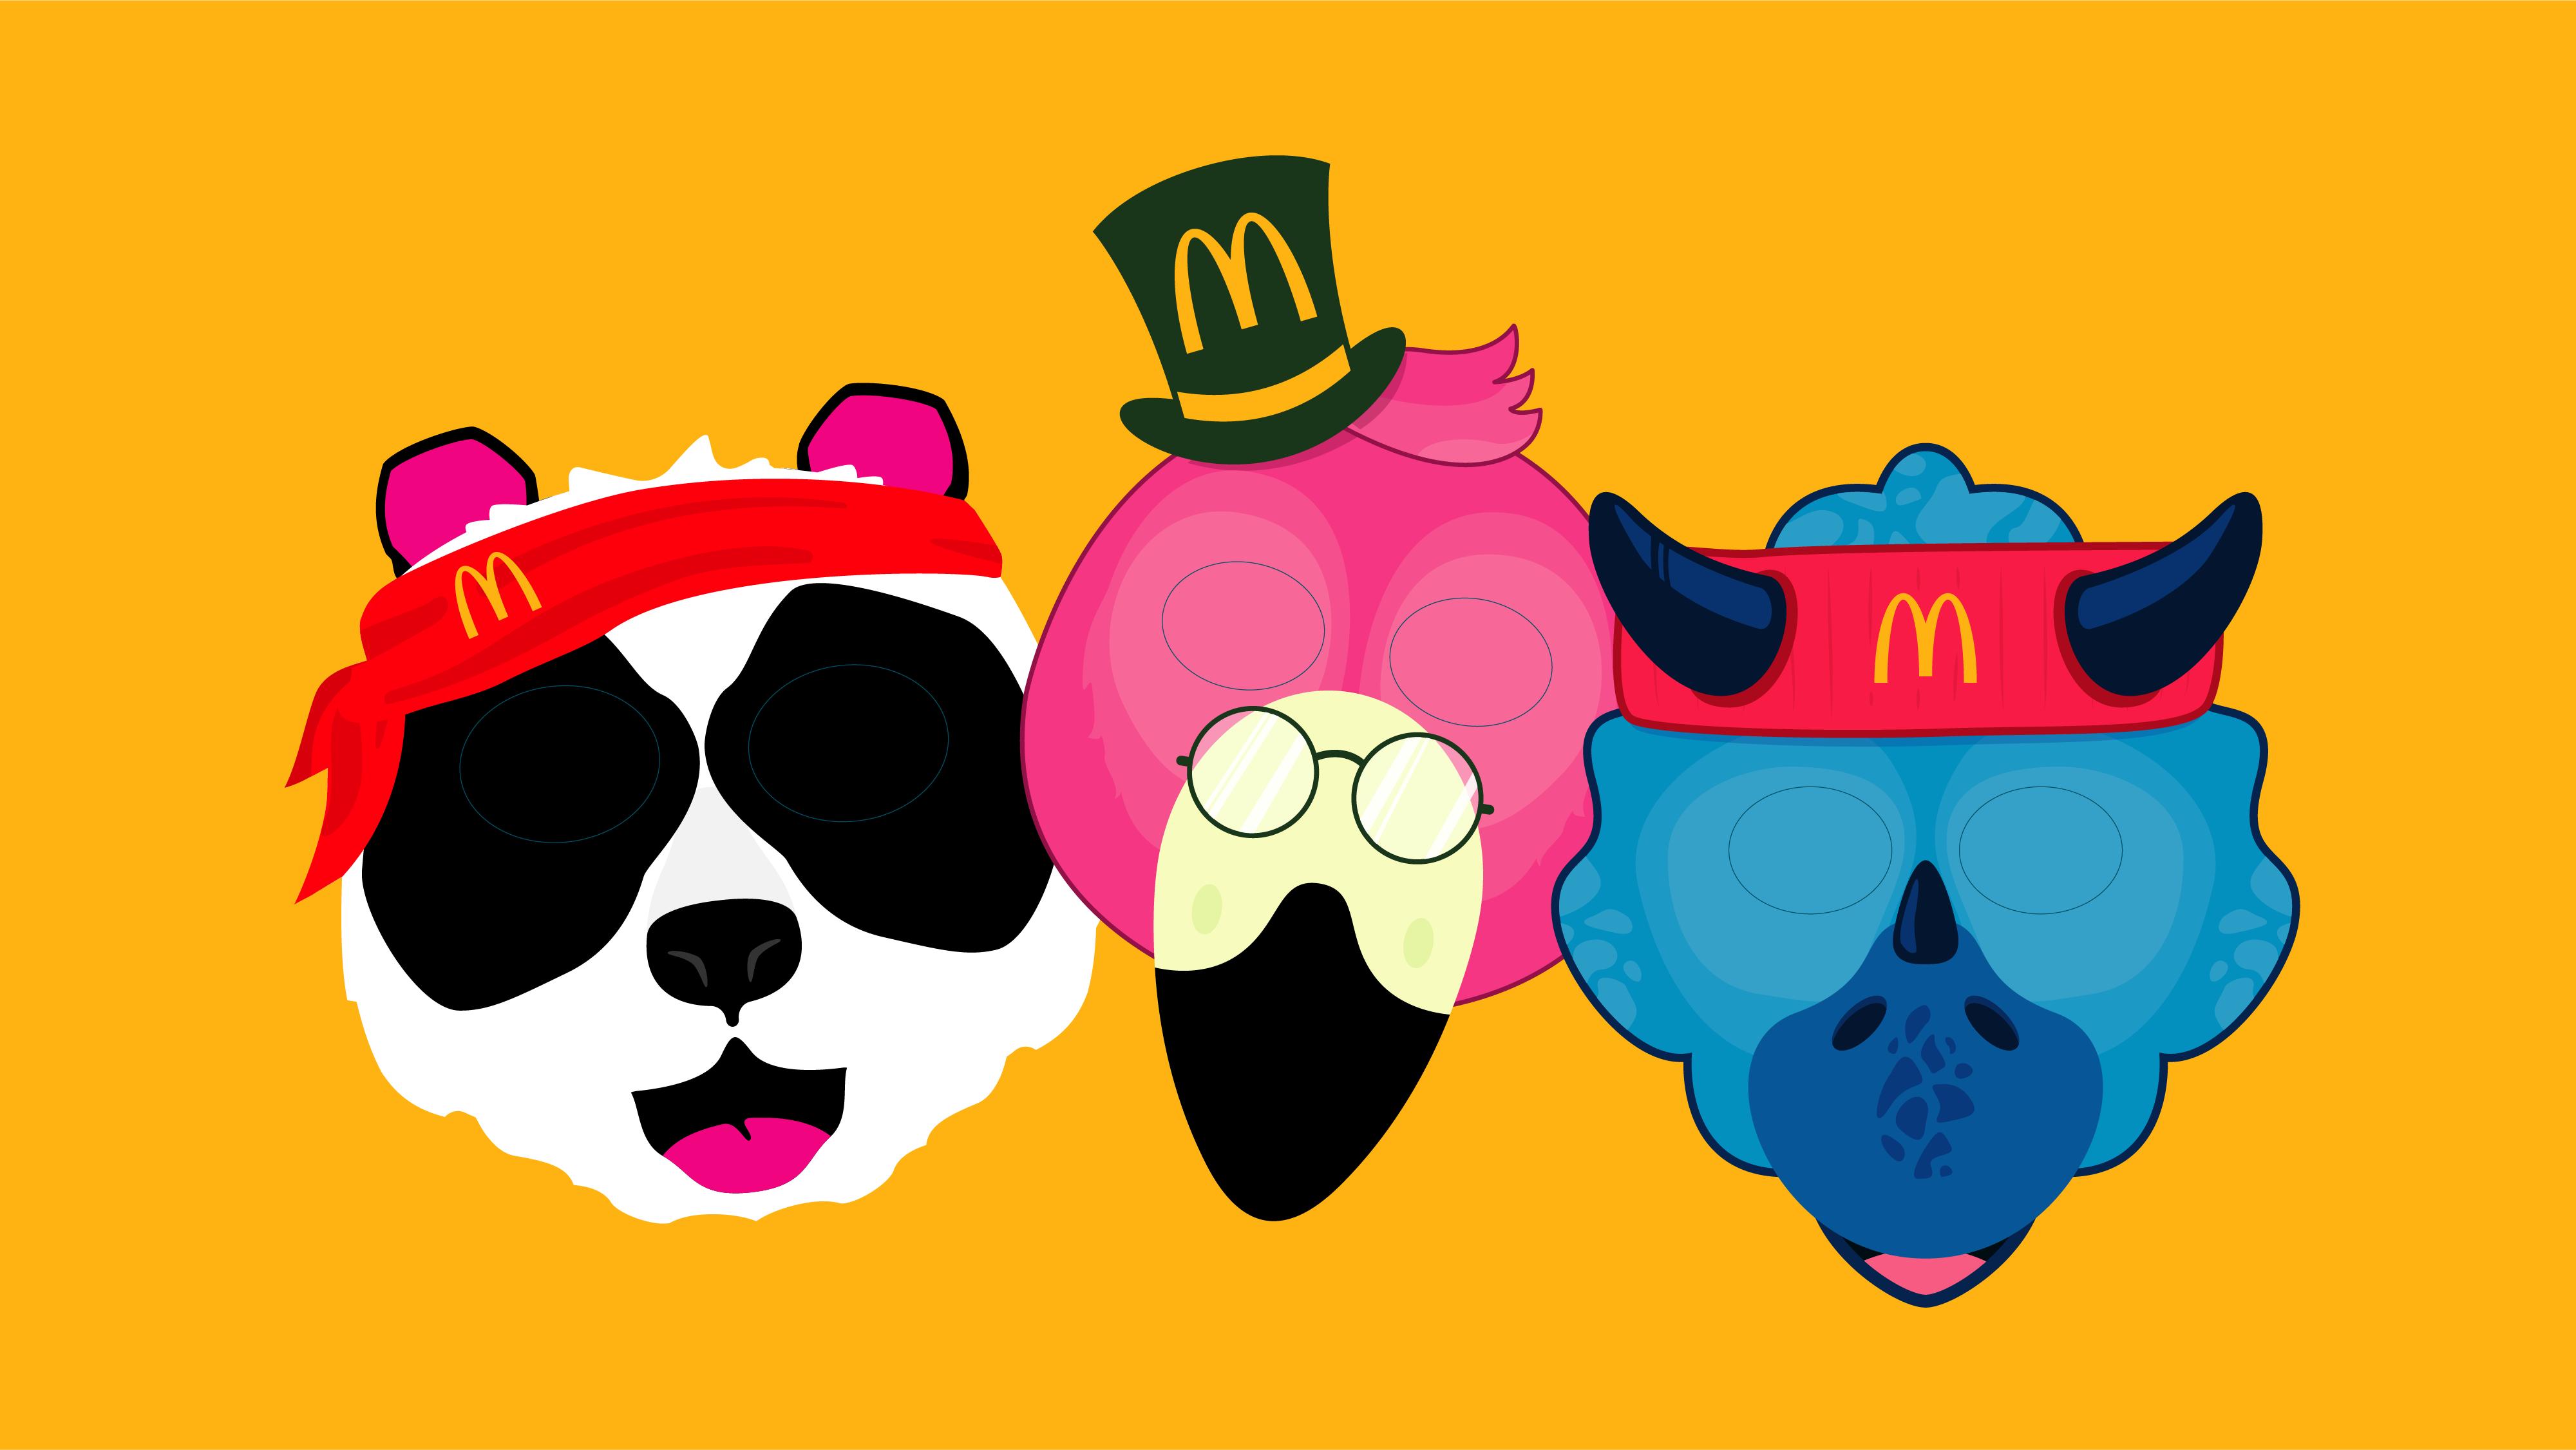 McDonalds - Paper masks